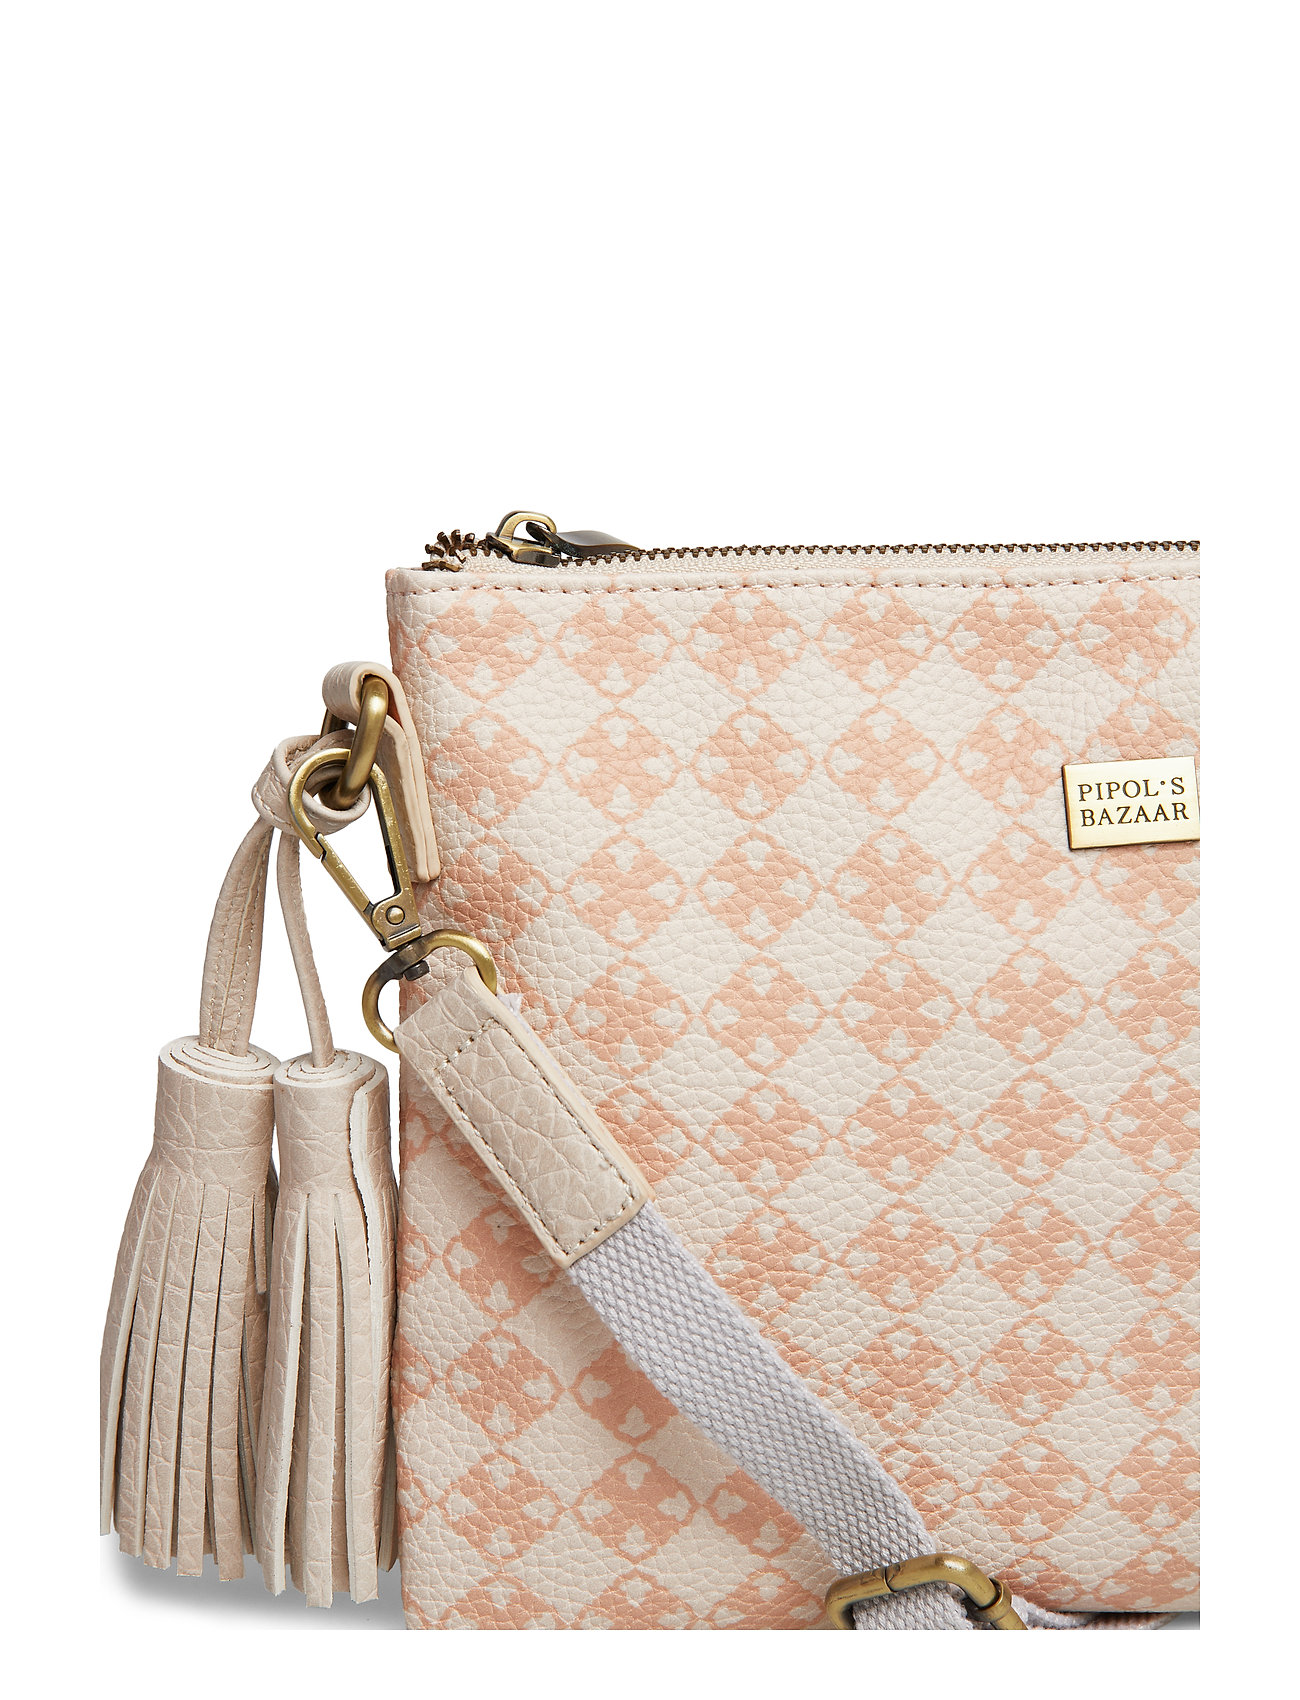 Cross Bazaar Bag Stile LogopinkPipol's Pipols rdeEQBCxoW